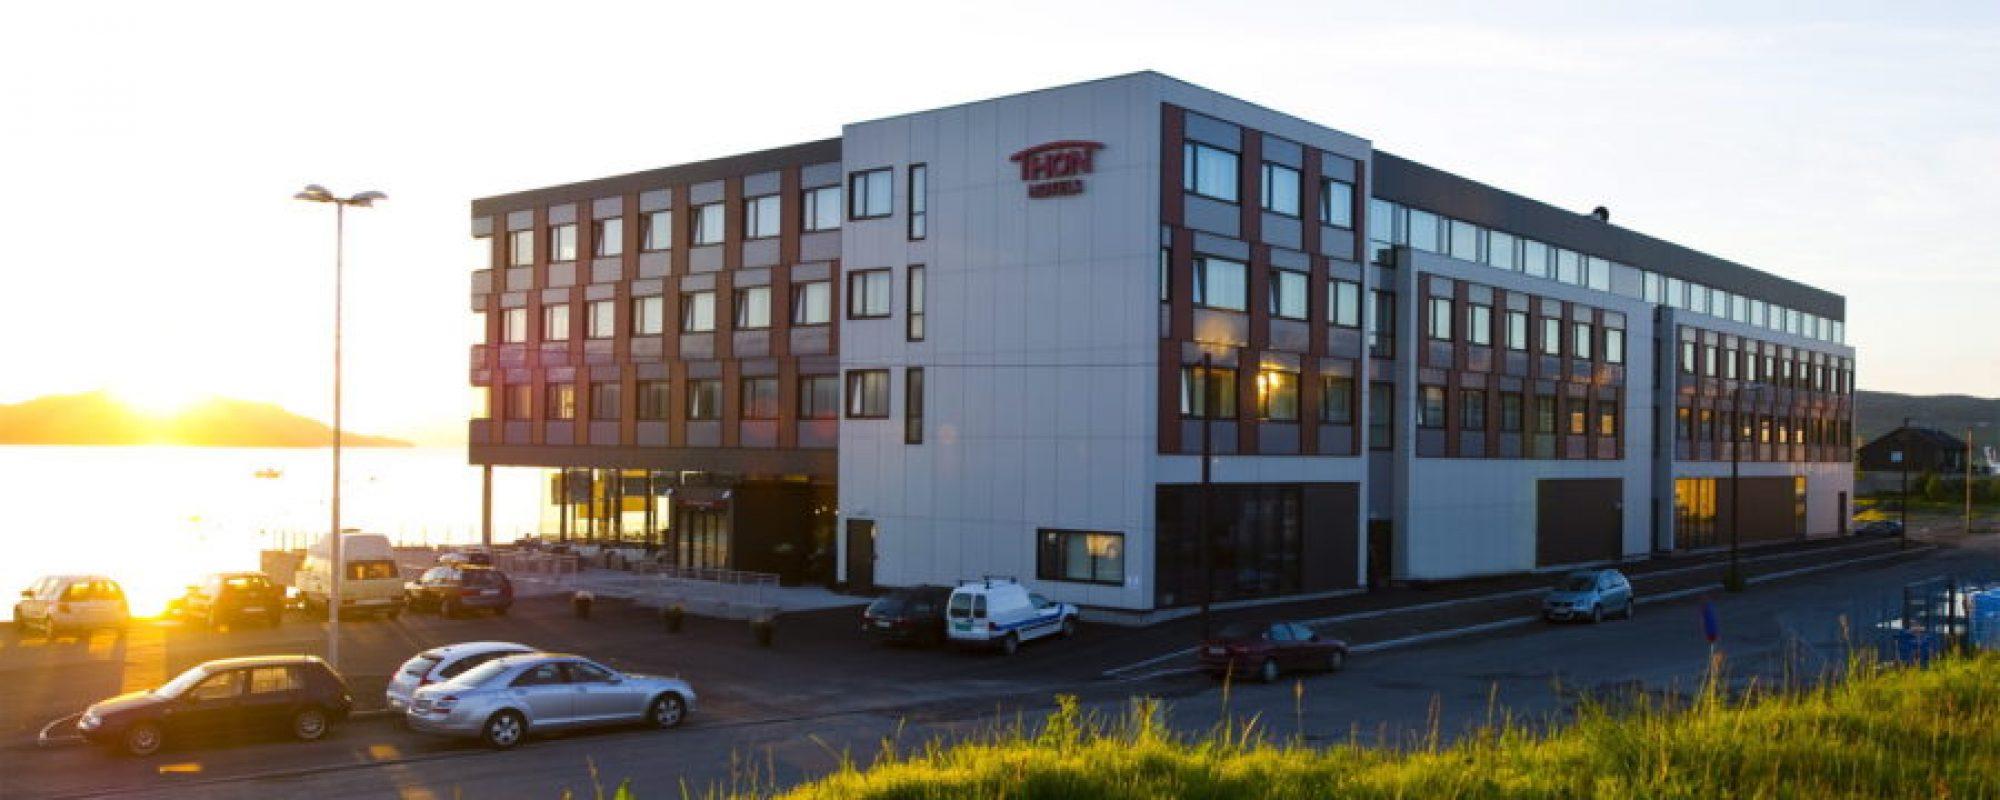 0-Thon-Hotel-Kirkenes-Fasade-004